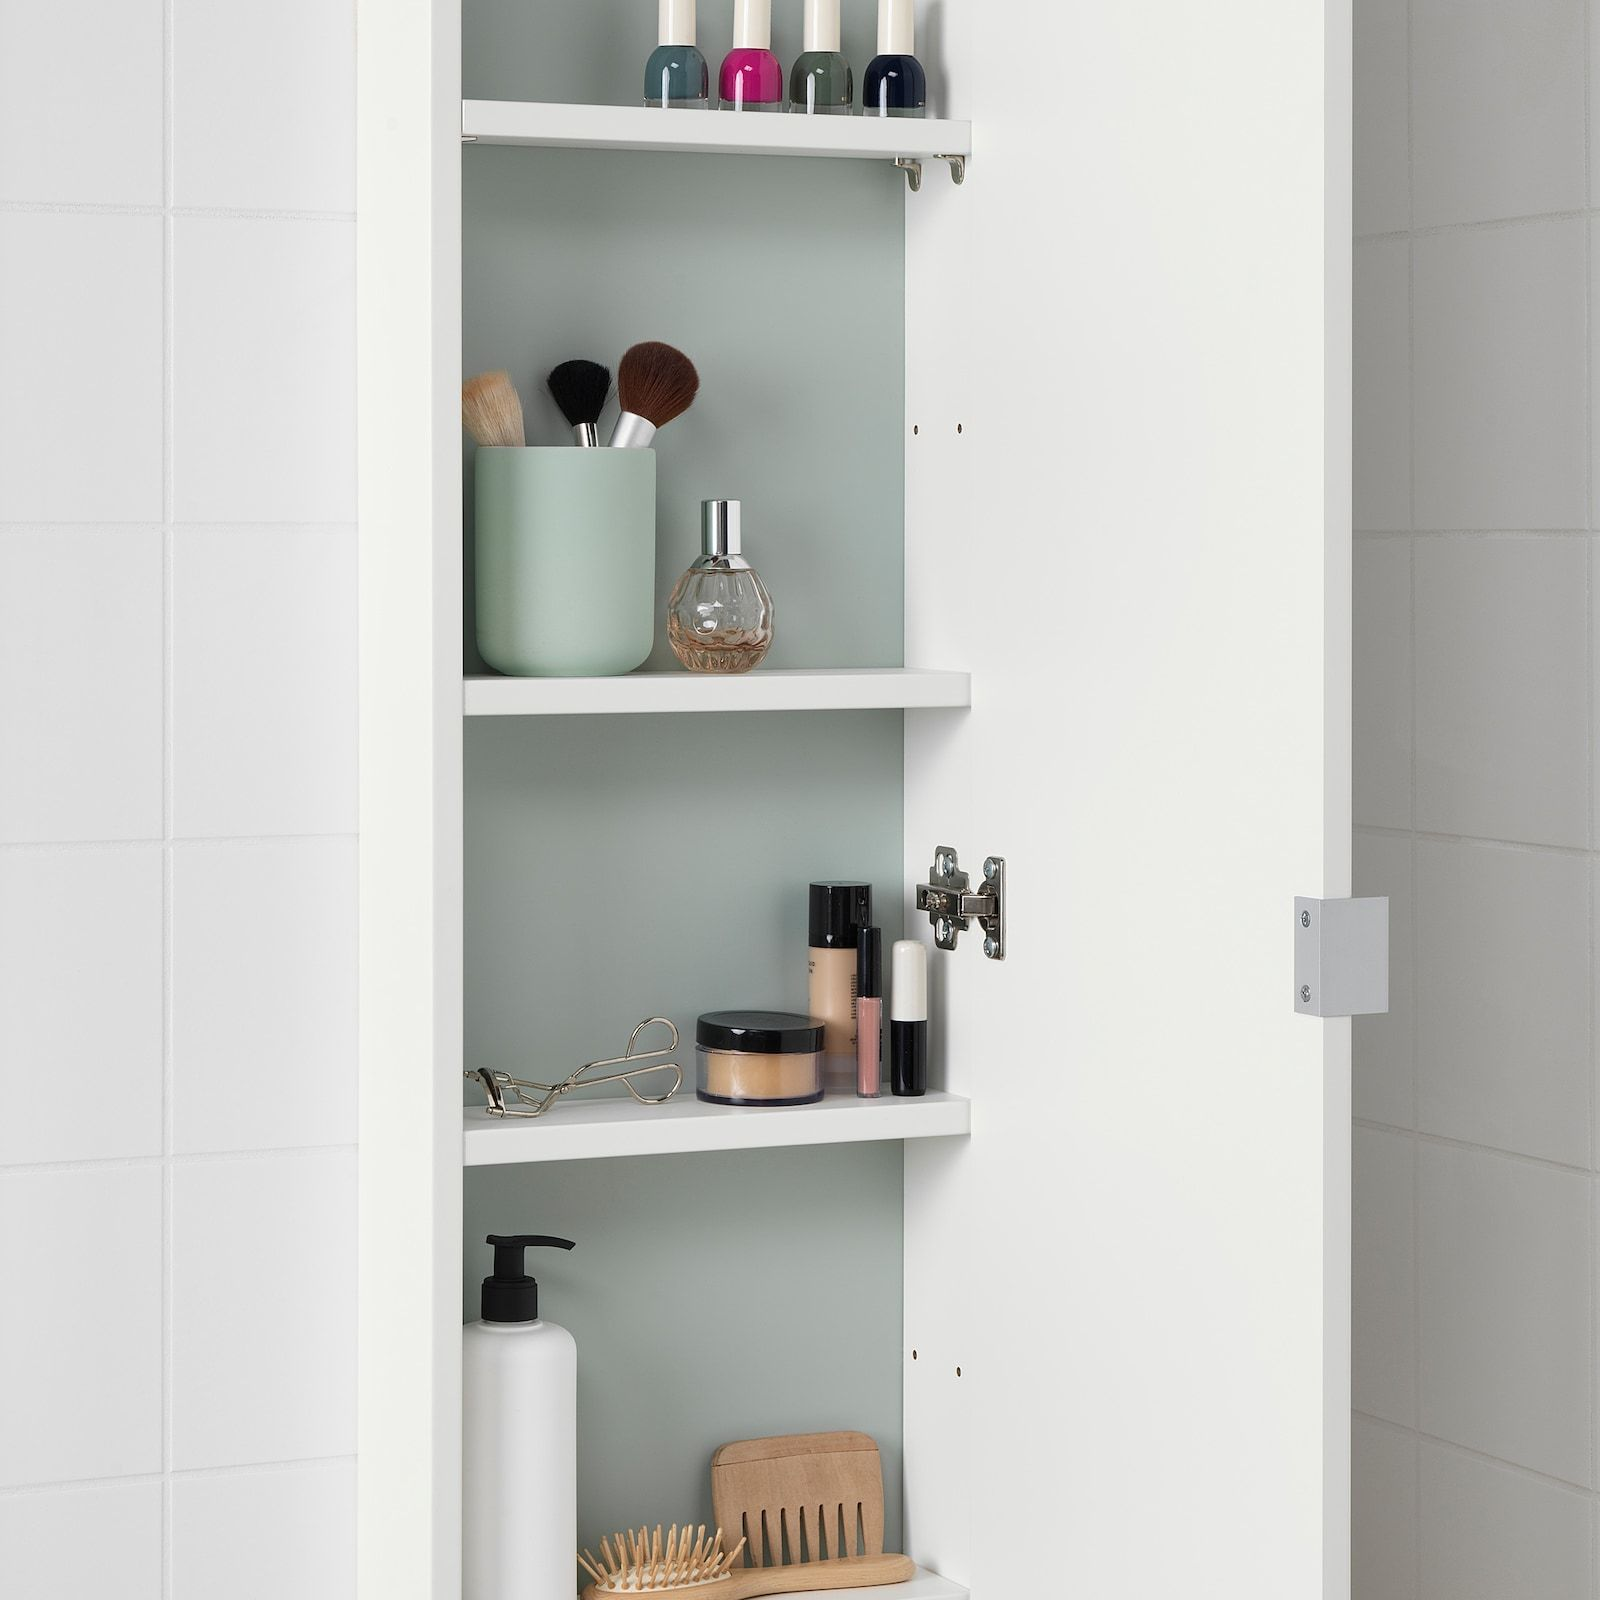 10 Great Ways To Add Storage To Your Bathroom Bathroom Wall Cabinets Bathroom Wall Storage Cabinets Wall Storage Cabinets